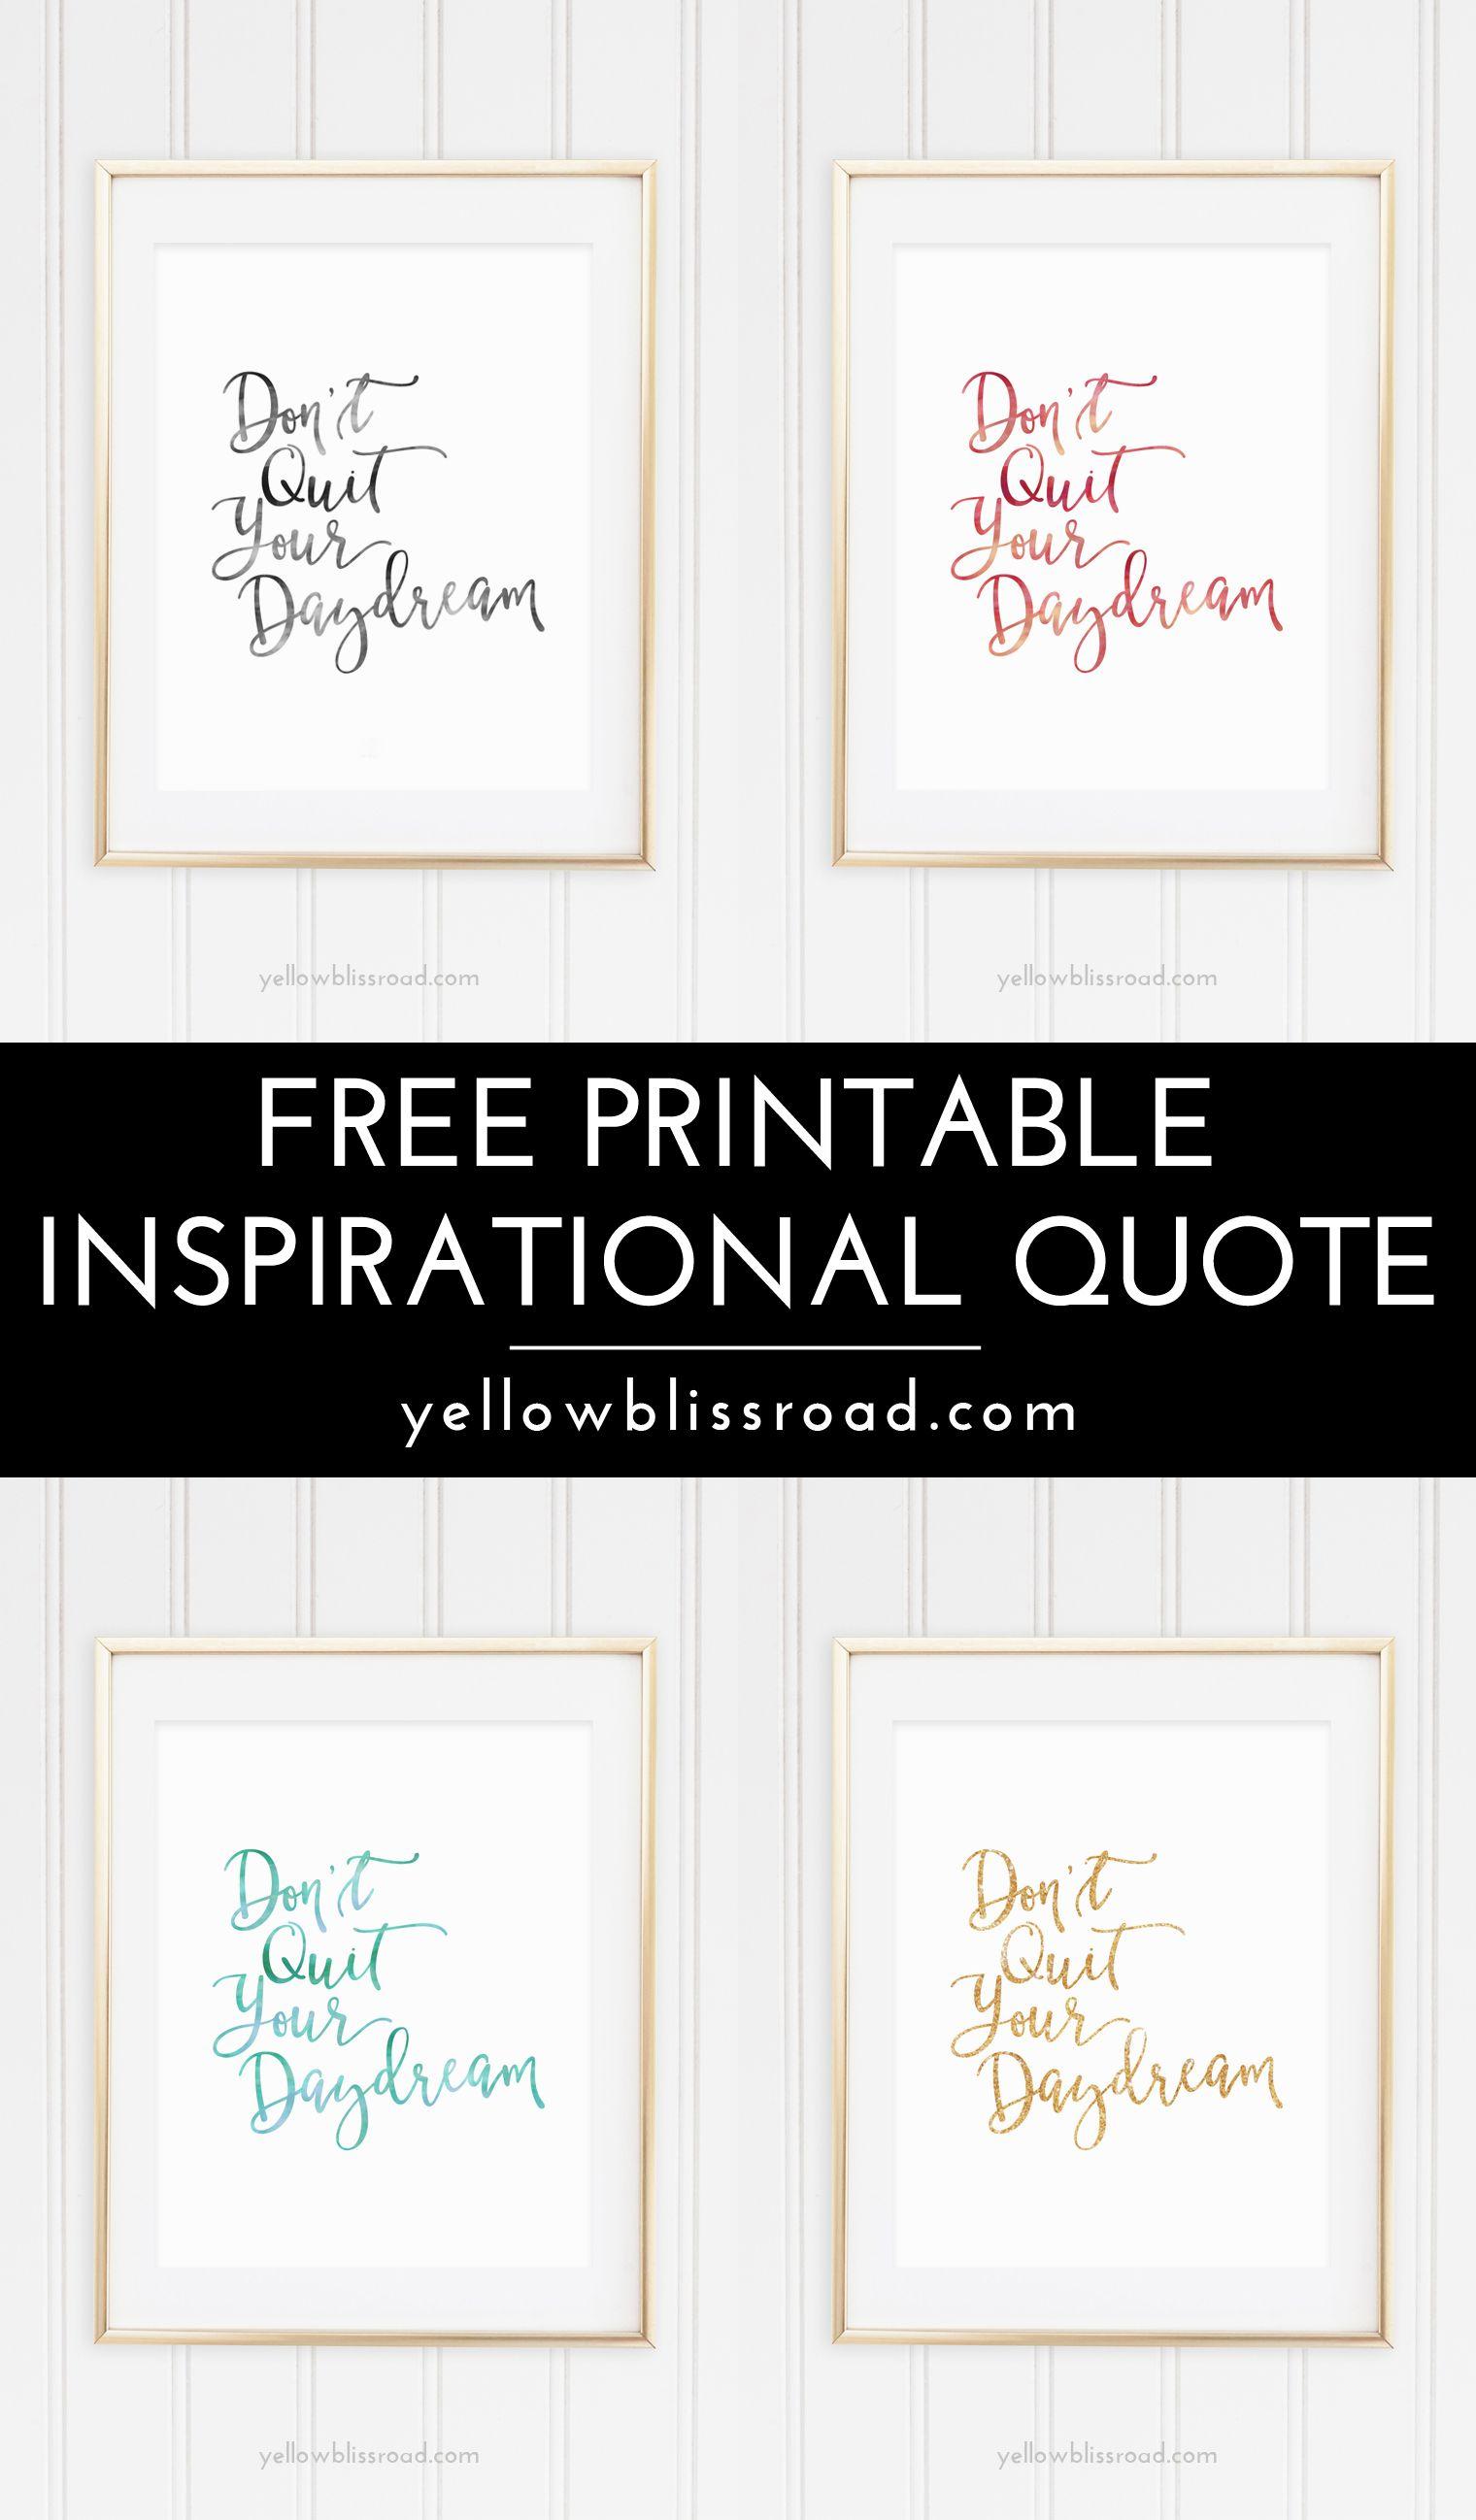 Free Inspiration Quote Printable | Free Printable Wall Art, Quotes - Free Printable Quotes Templates